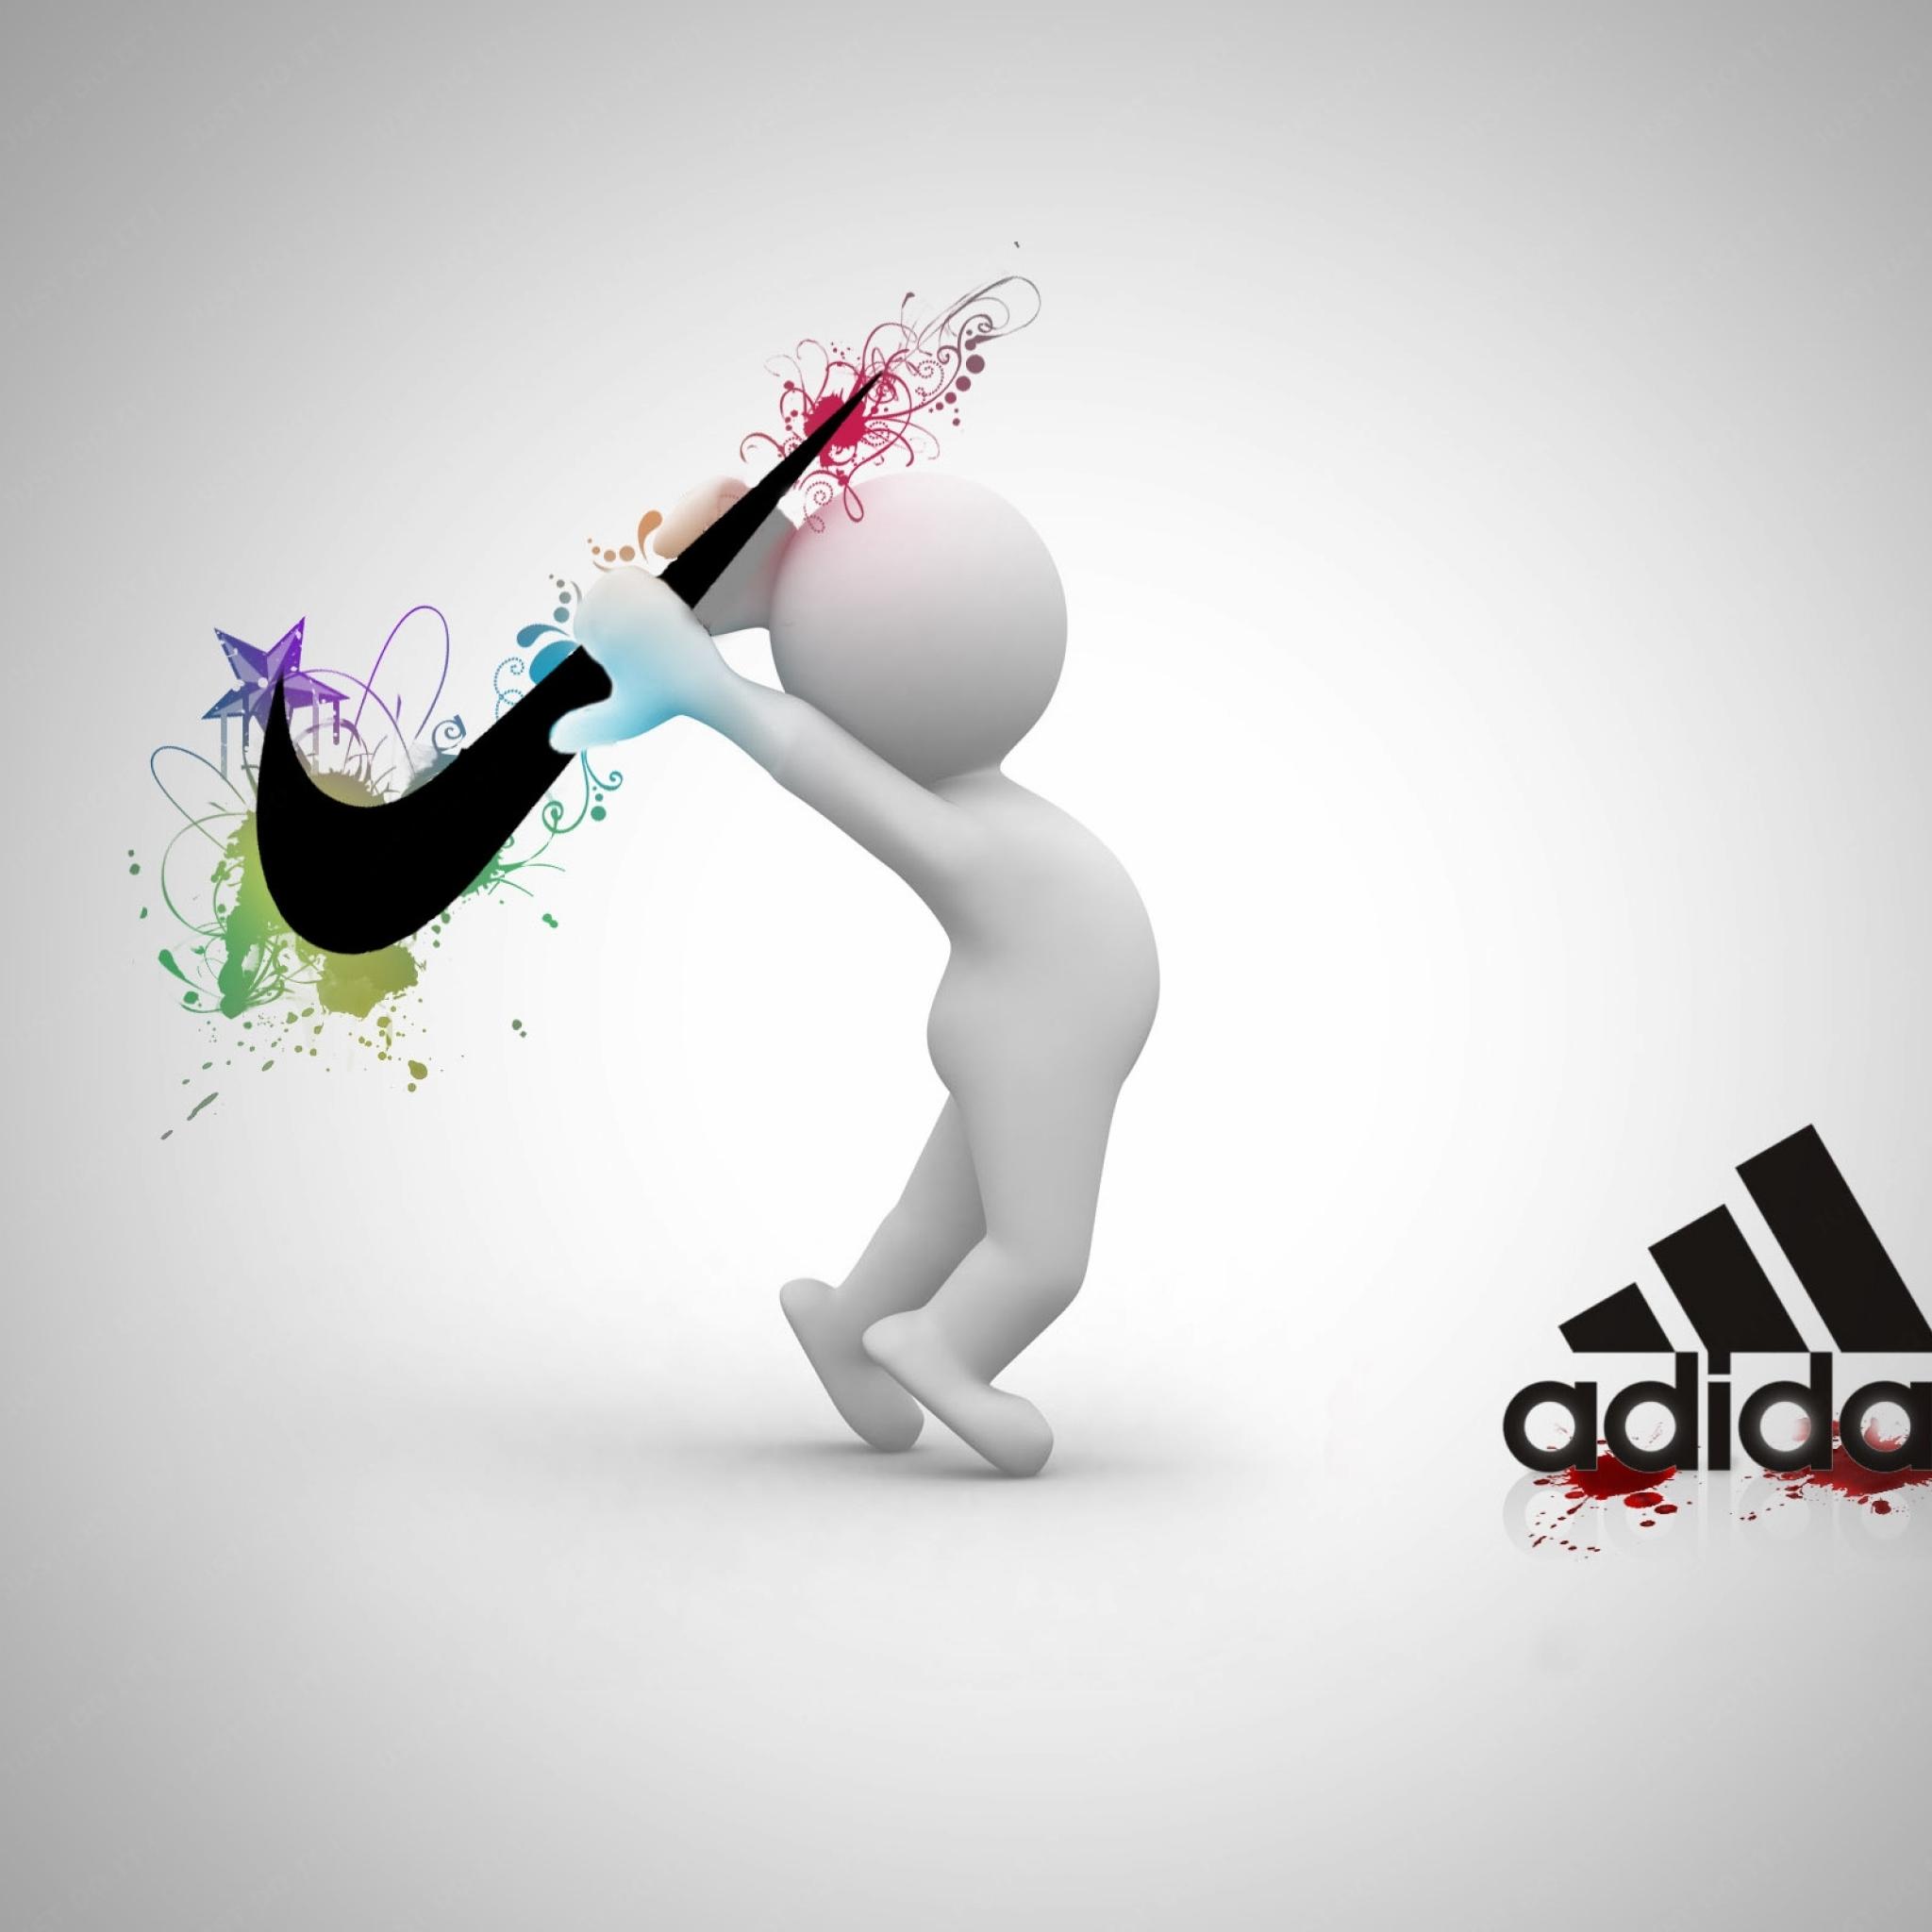 Adidas clipart nike air Adidas Wallpaper  2048x2048 Adidas